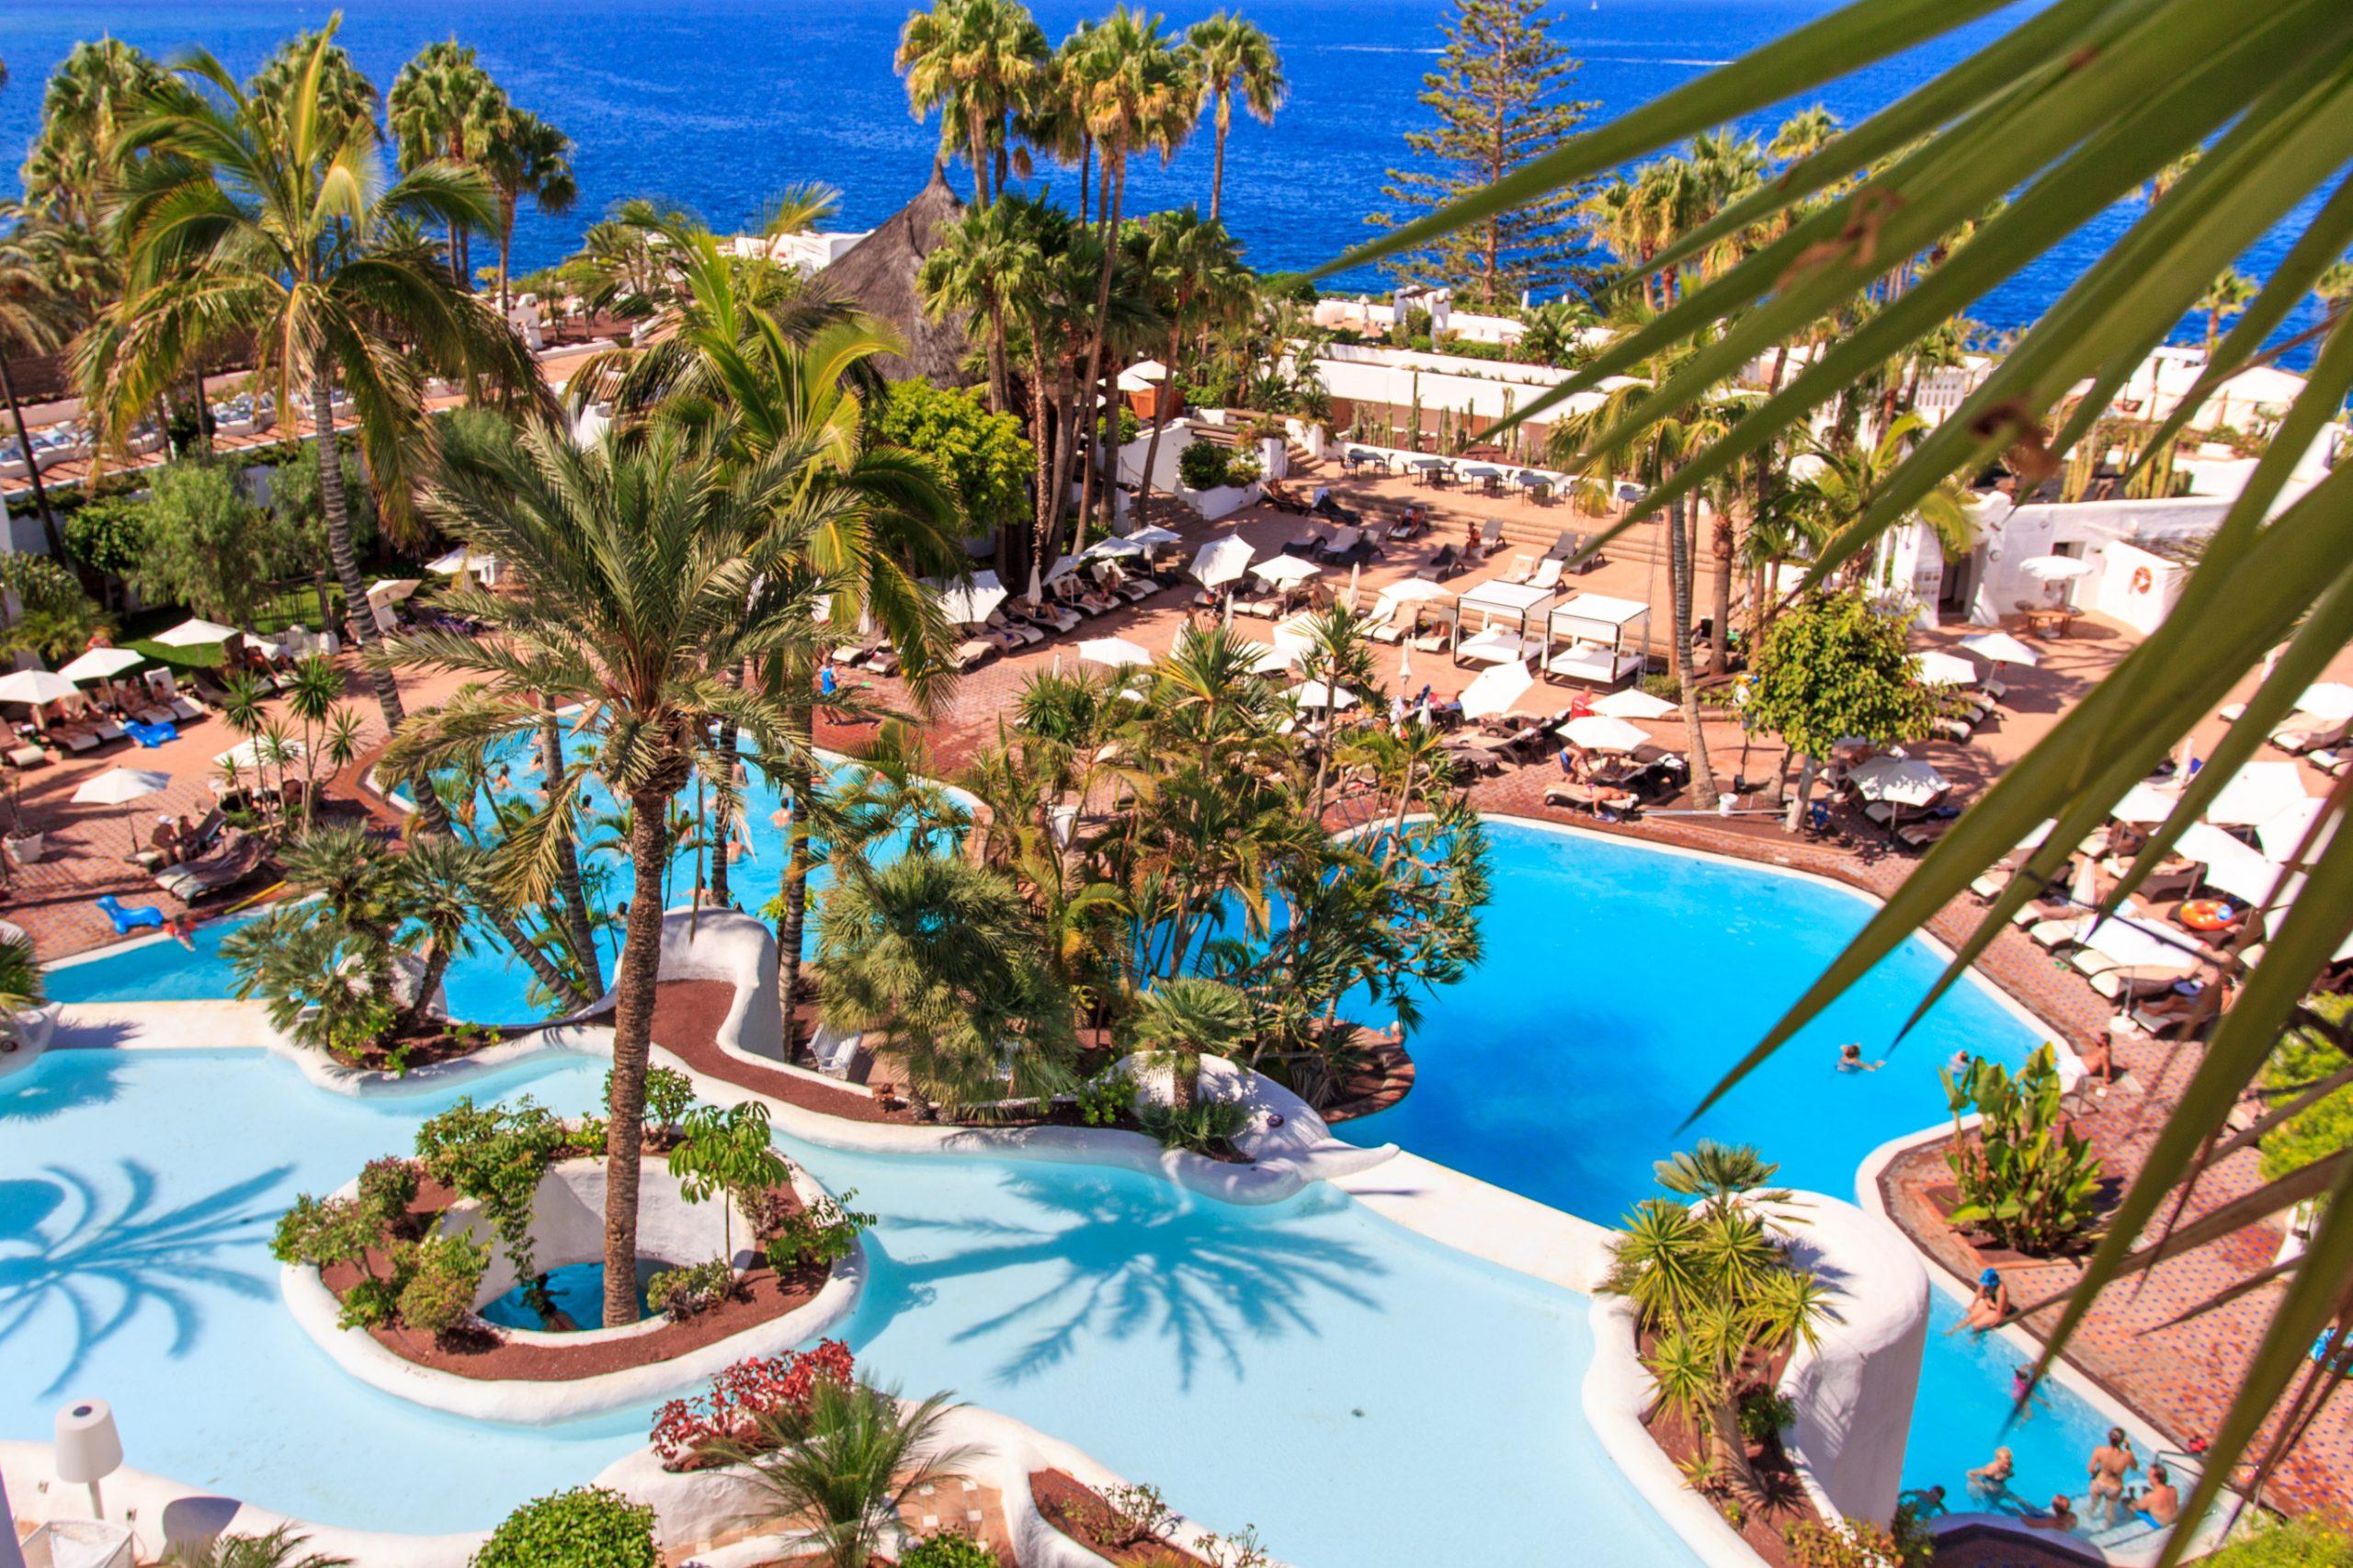 Golfing Fellowship - Europe concernant Jardin Tropical Tenerife